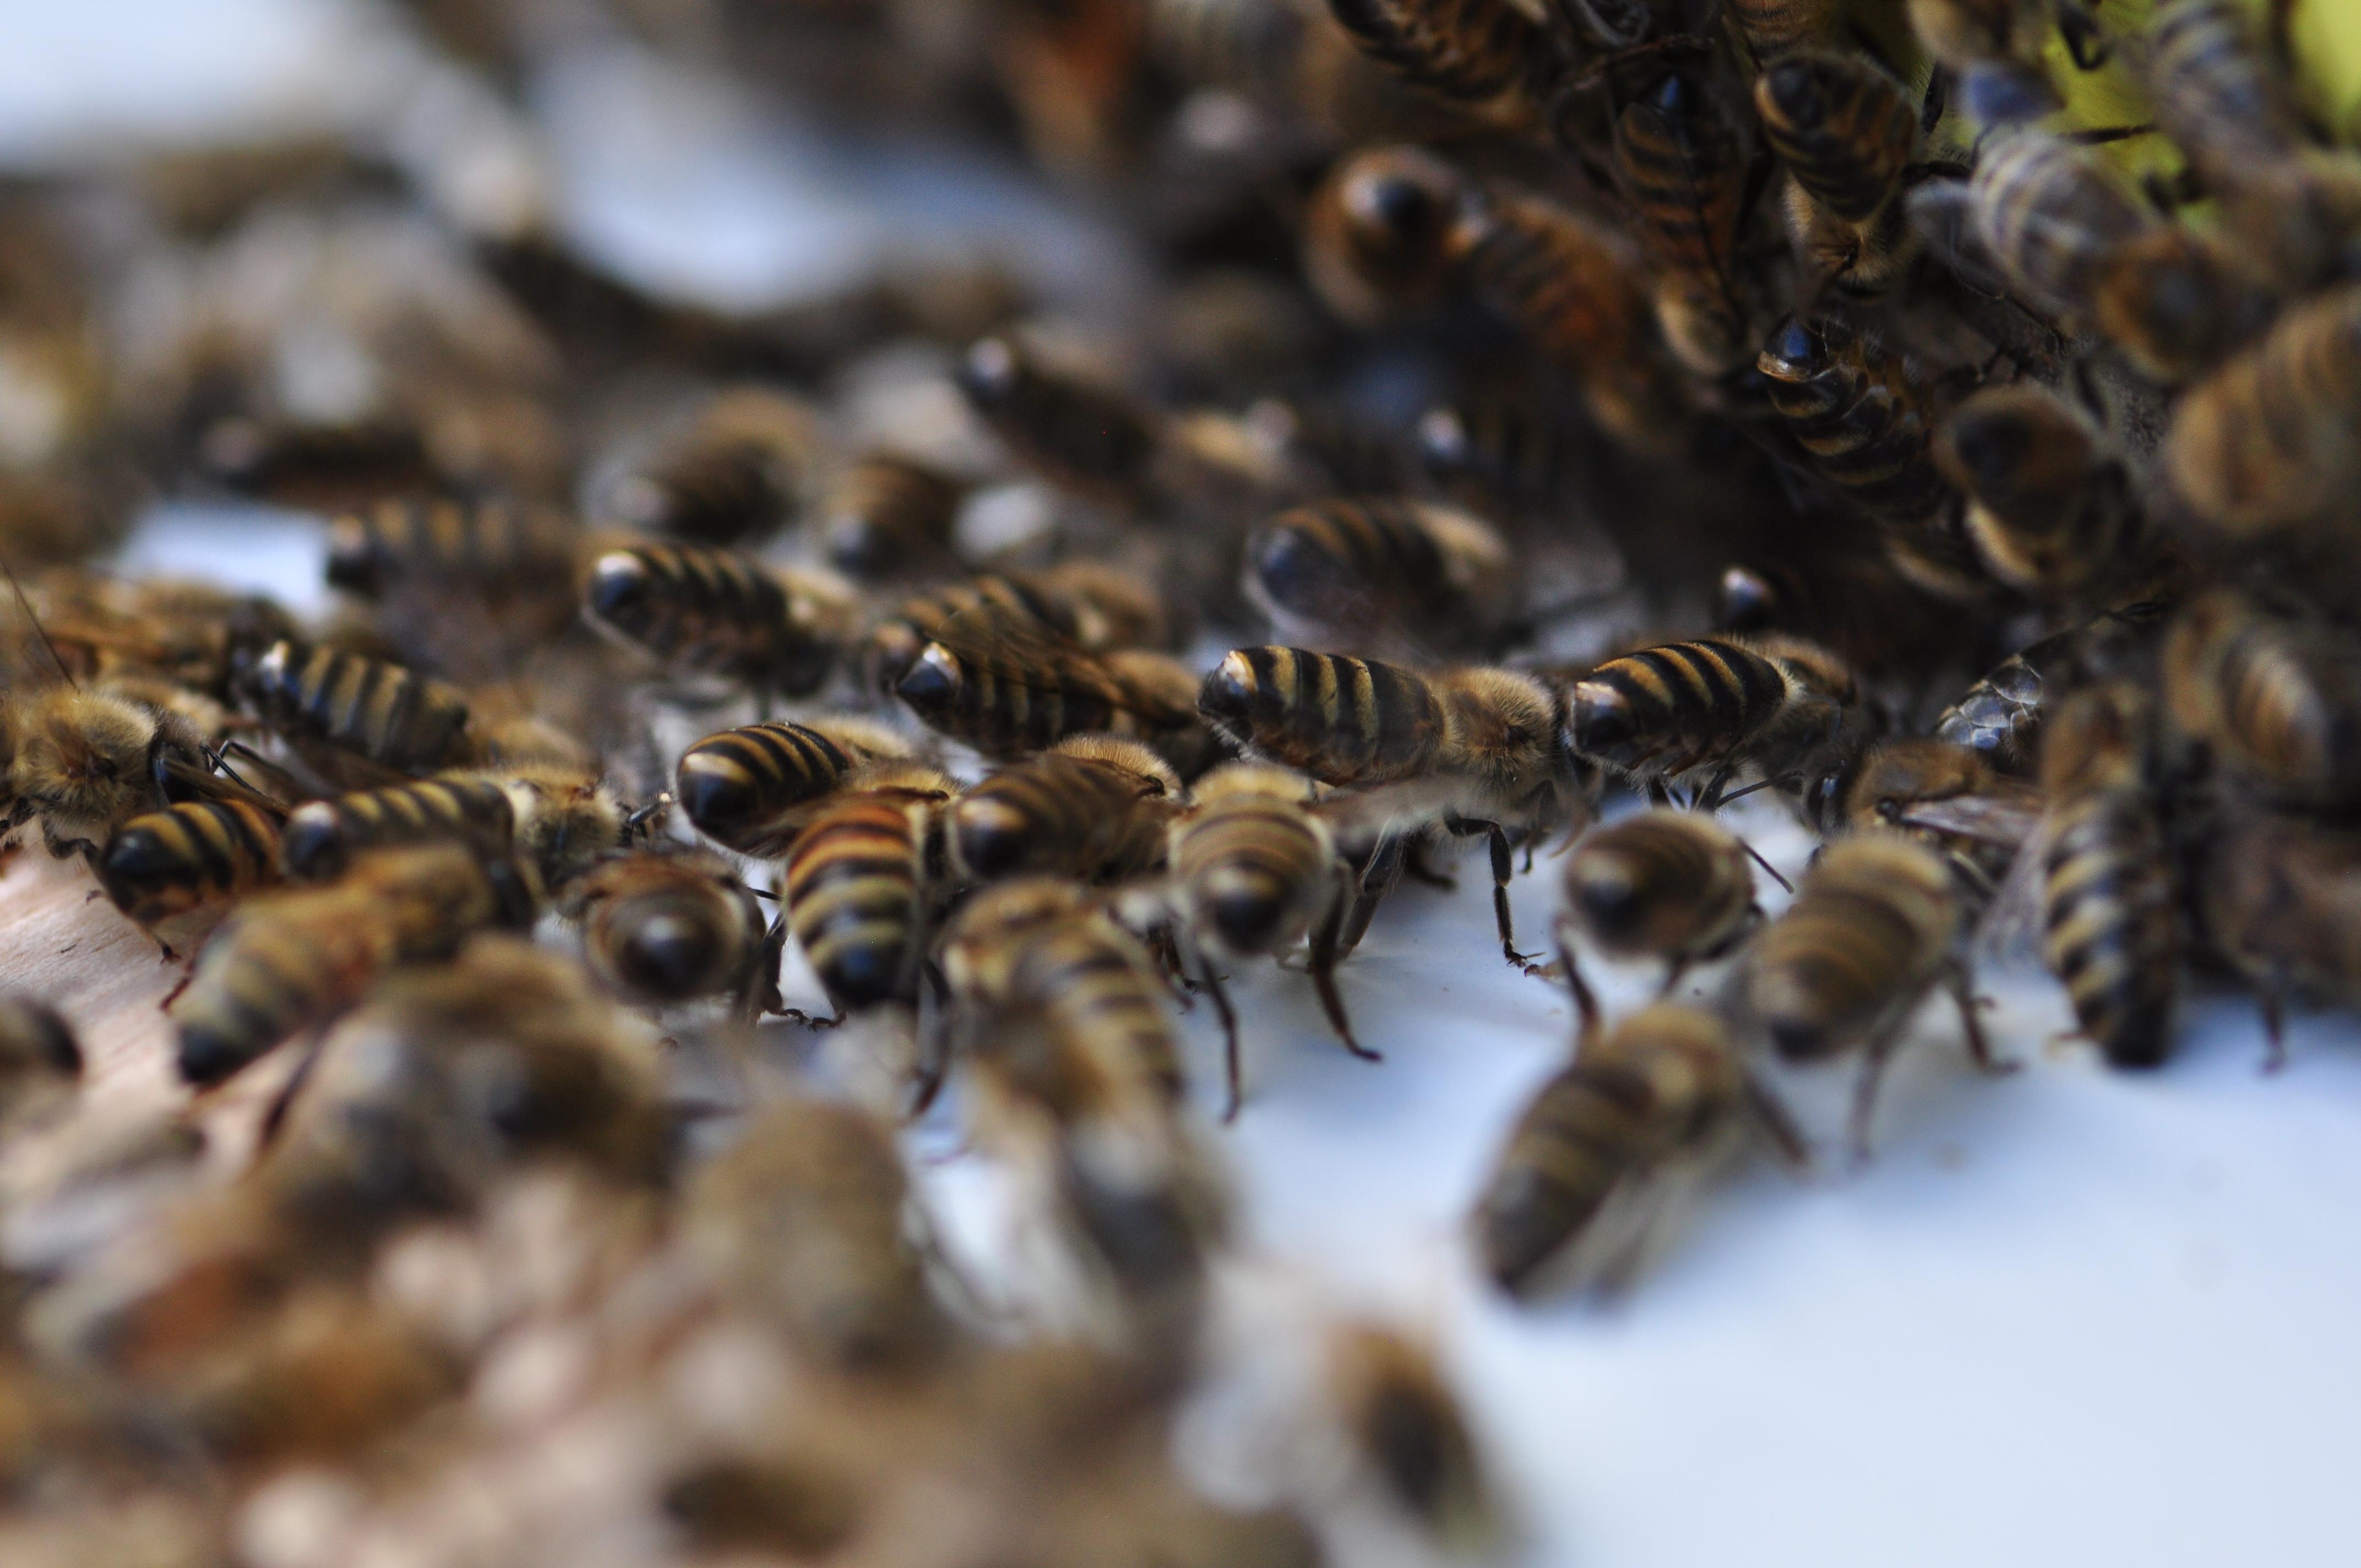 bees at the hive entrance